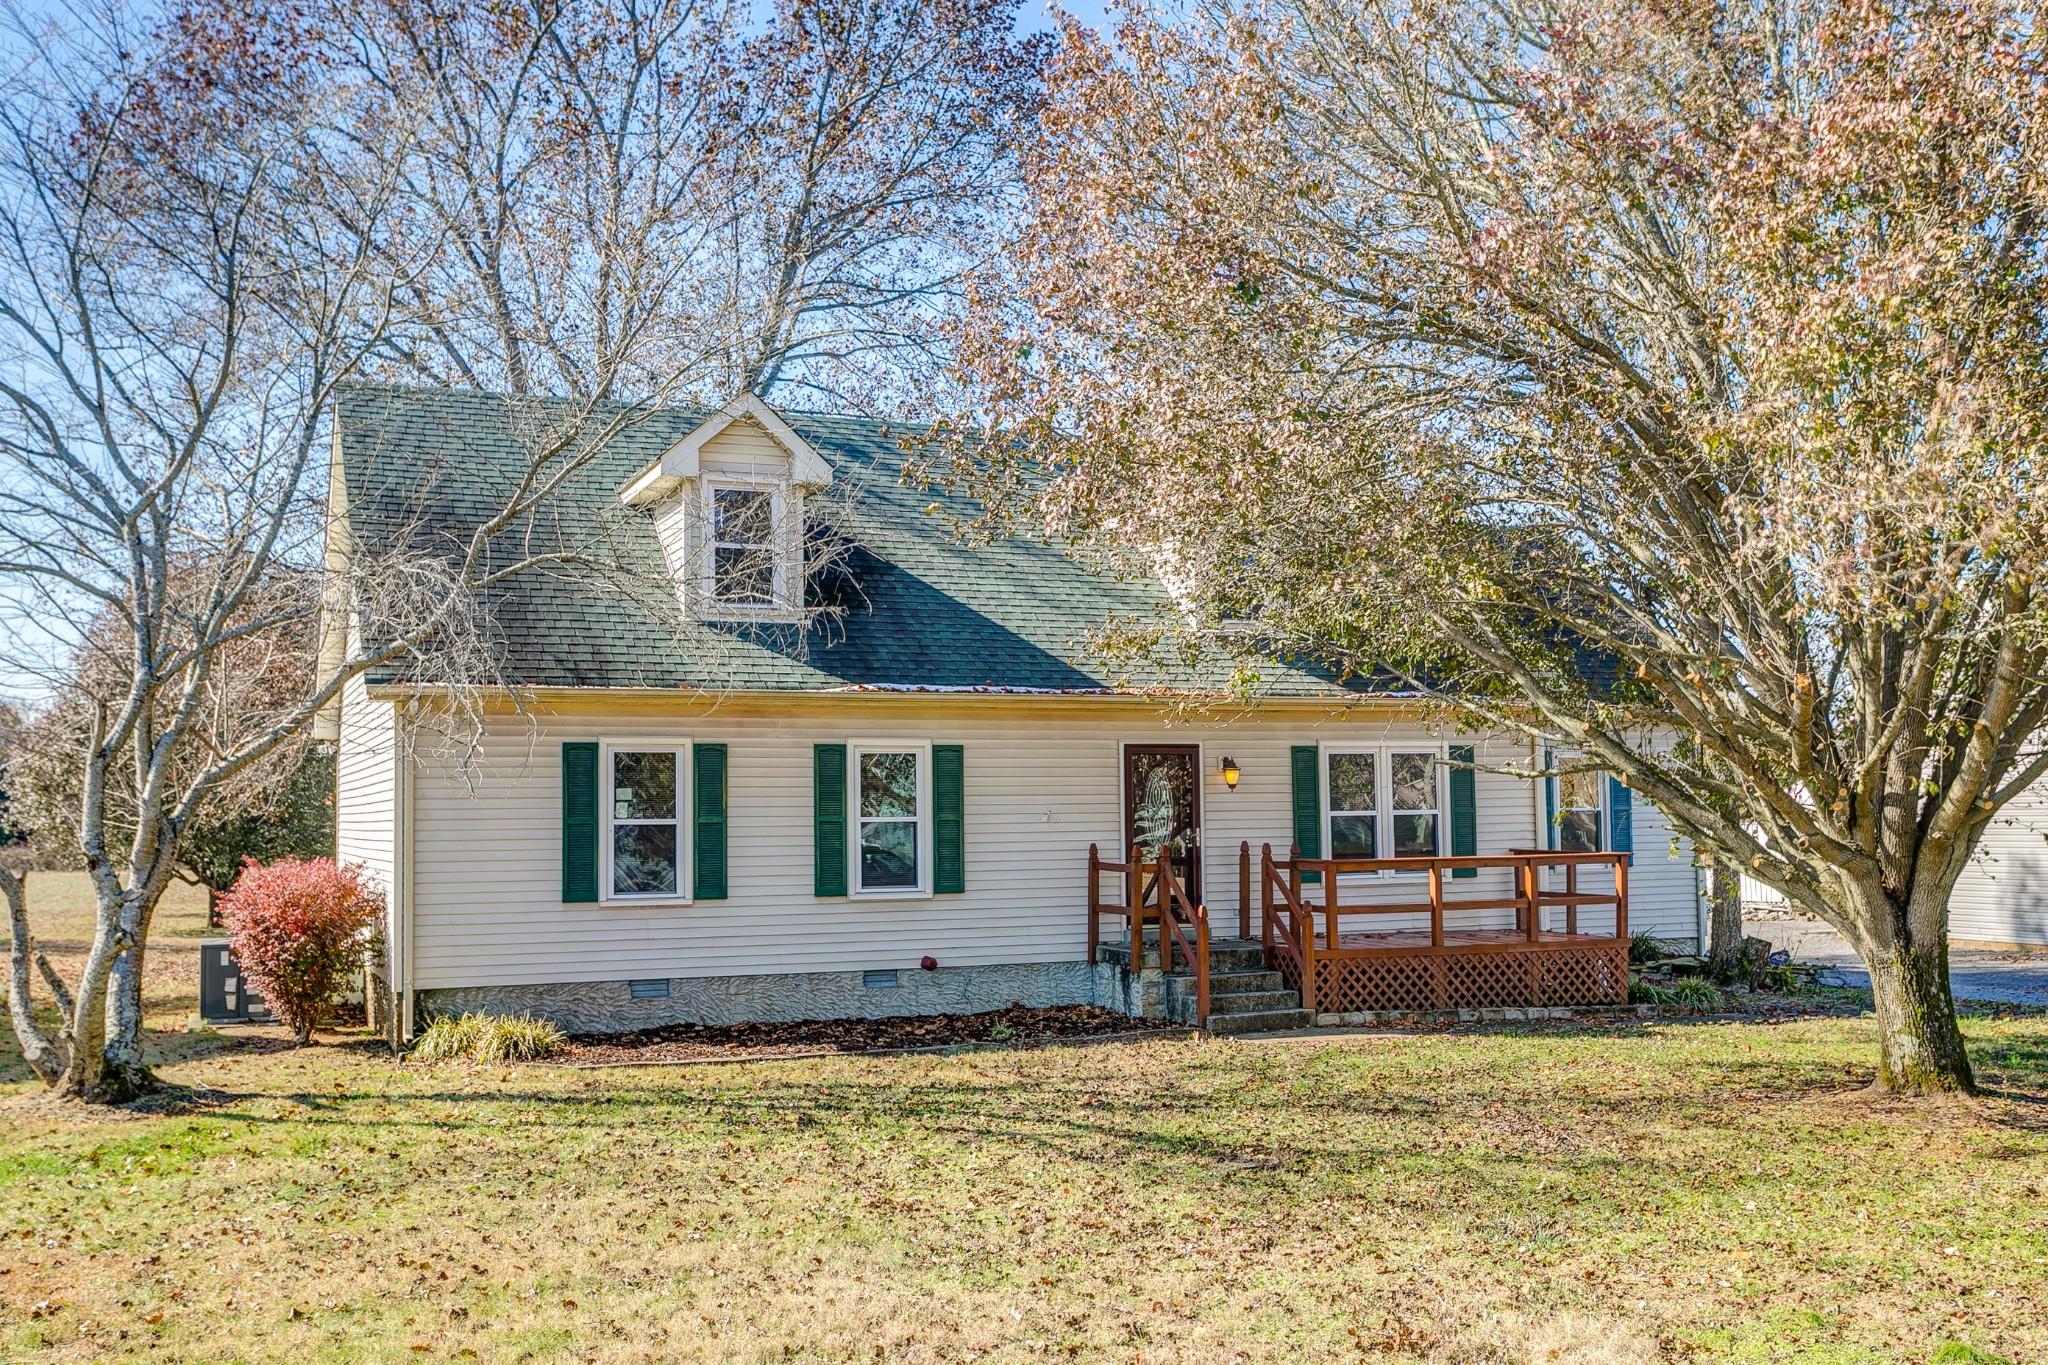 5812 Montaque Ave, Rockvale, TN 37153 - Rockvale, TN real estate listing